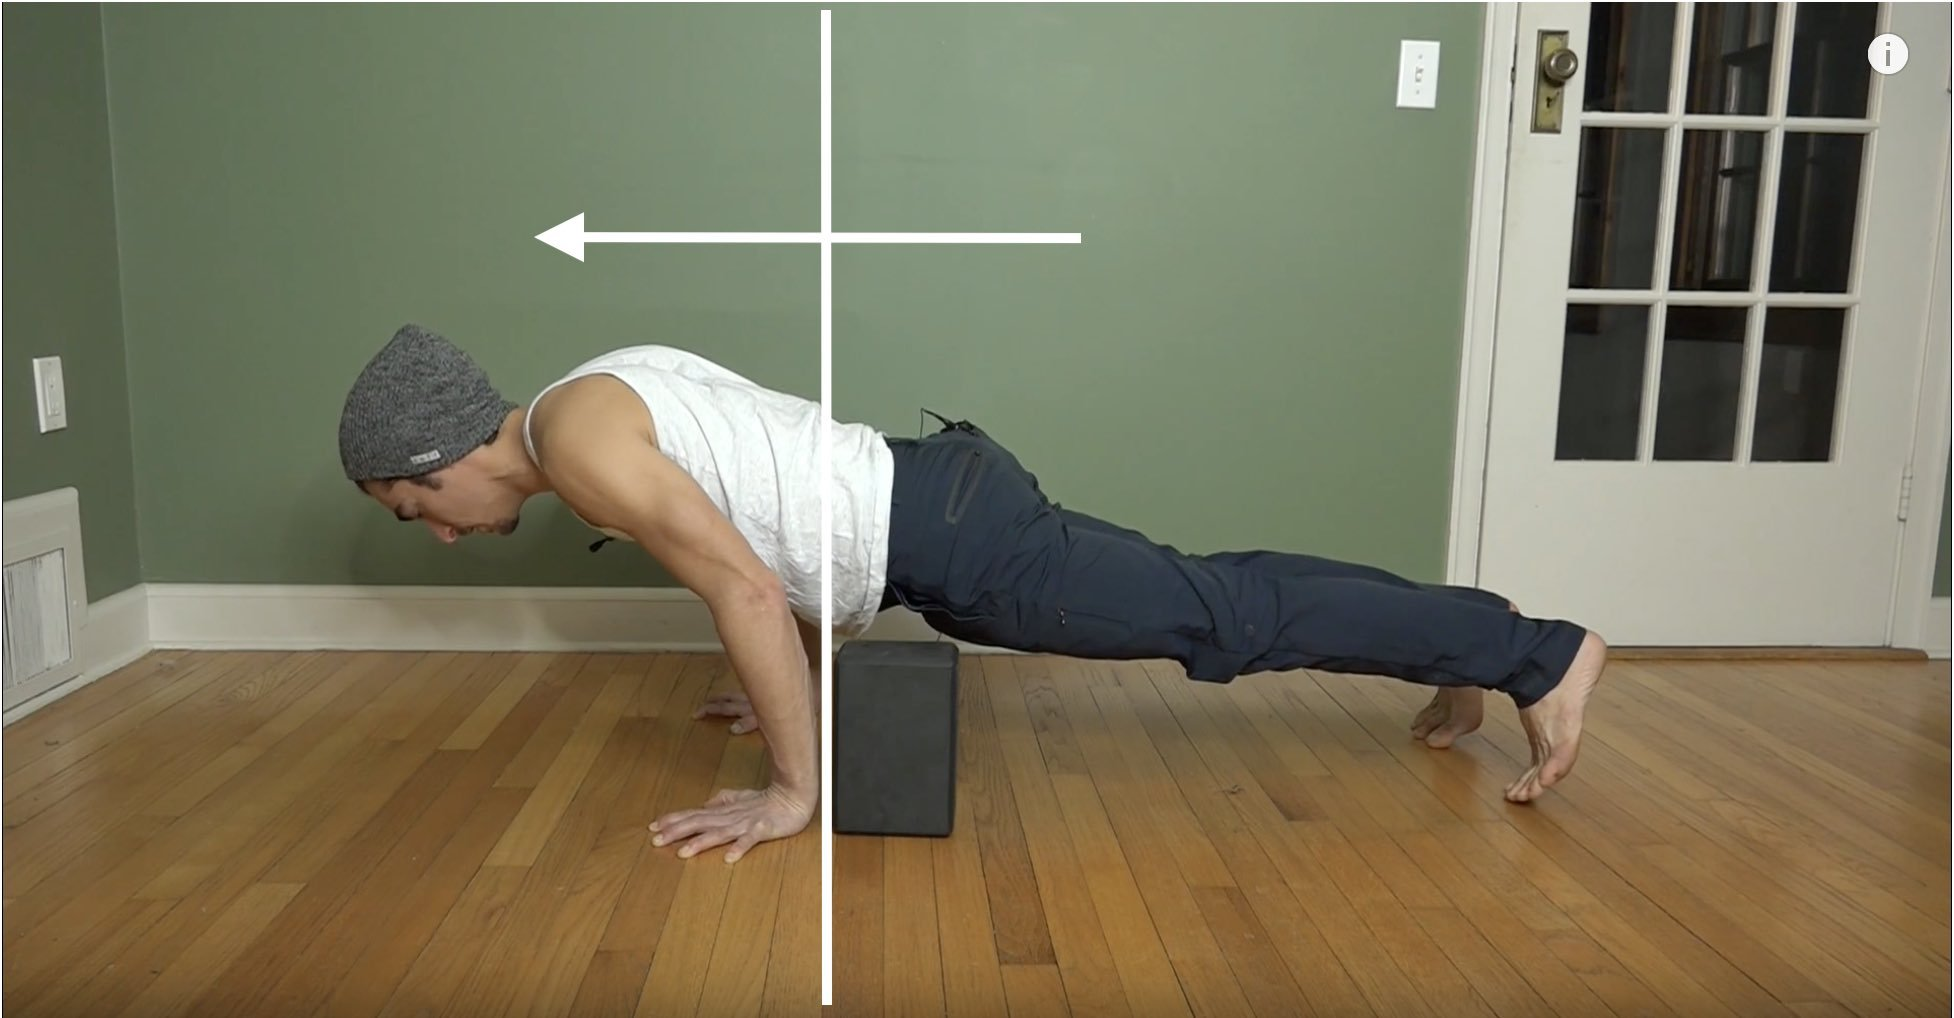 chaturanga with block for wrist strength